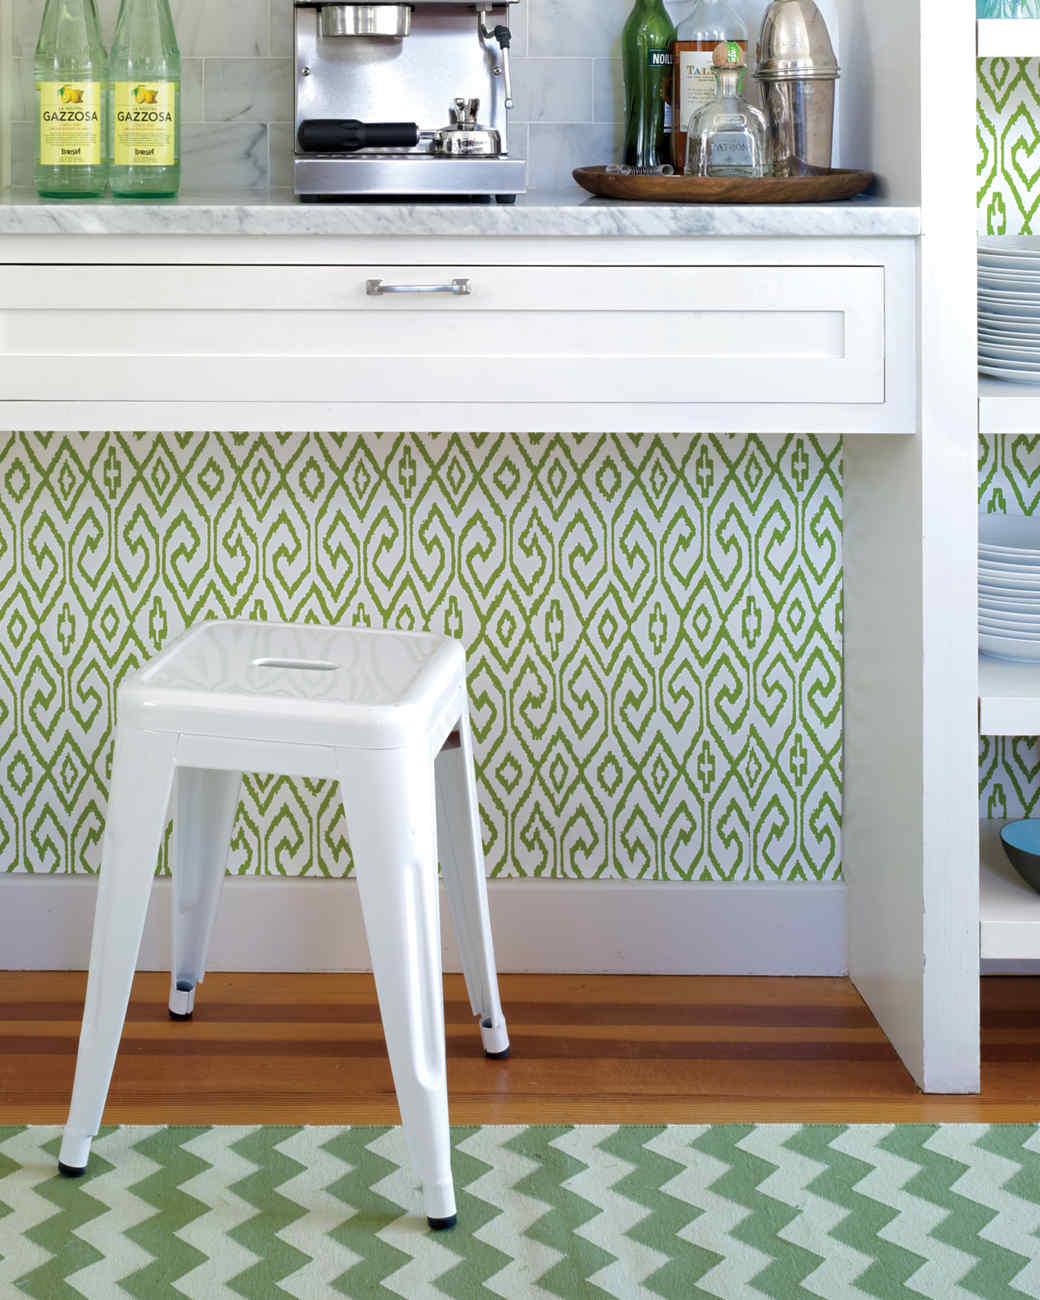 cw-mitchell-kitchen-stool-mld107949.jpg